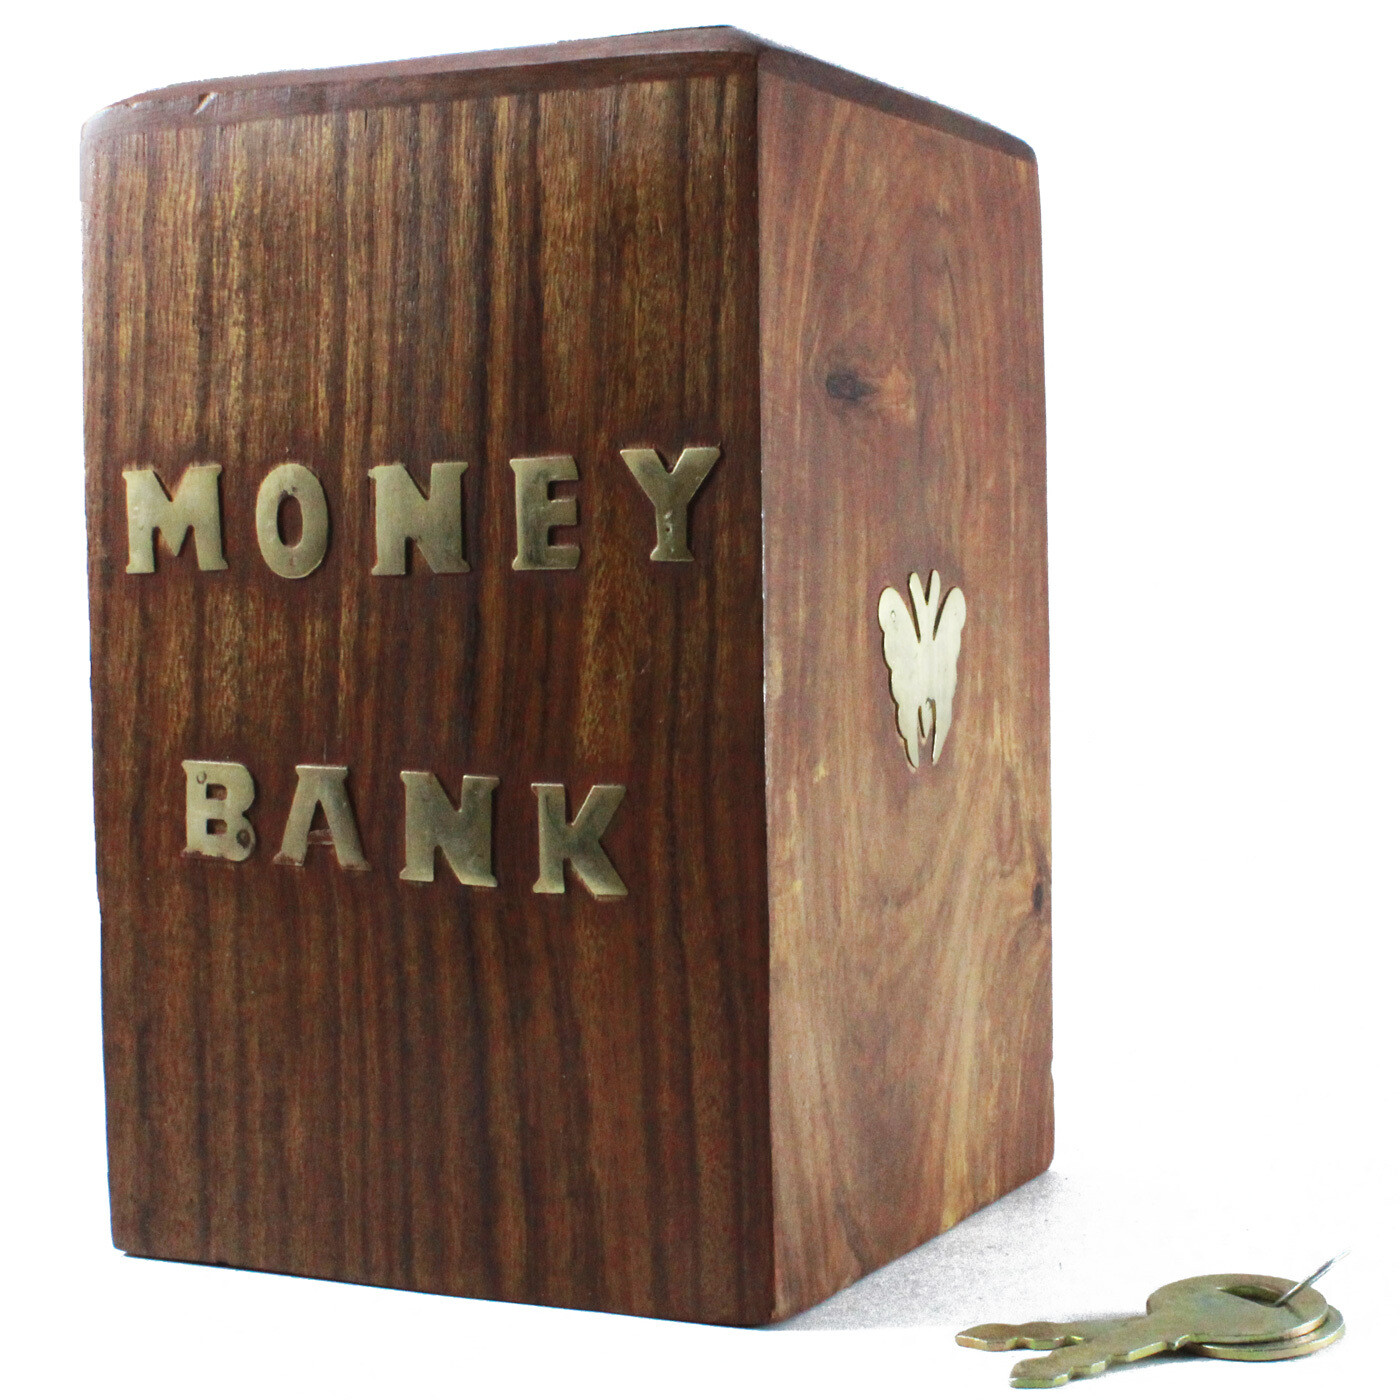 Handmade Wood Coin Bank    Piggy Bank    Gift for Boys    Gift for Girls    Savings Bank    Birthday Gift    Wooden Money Box